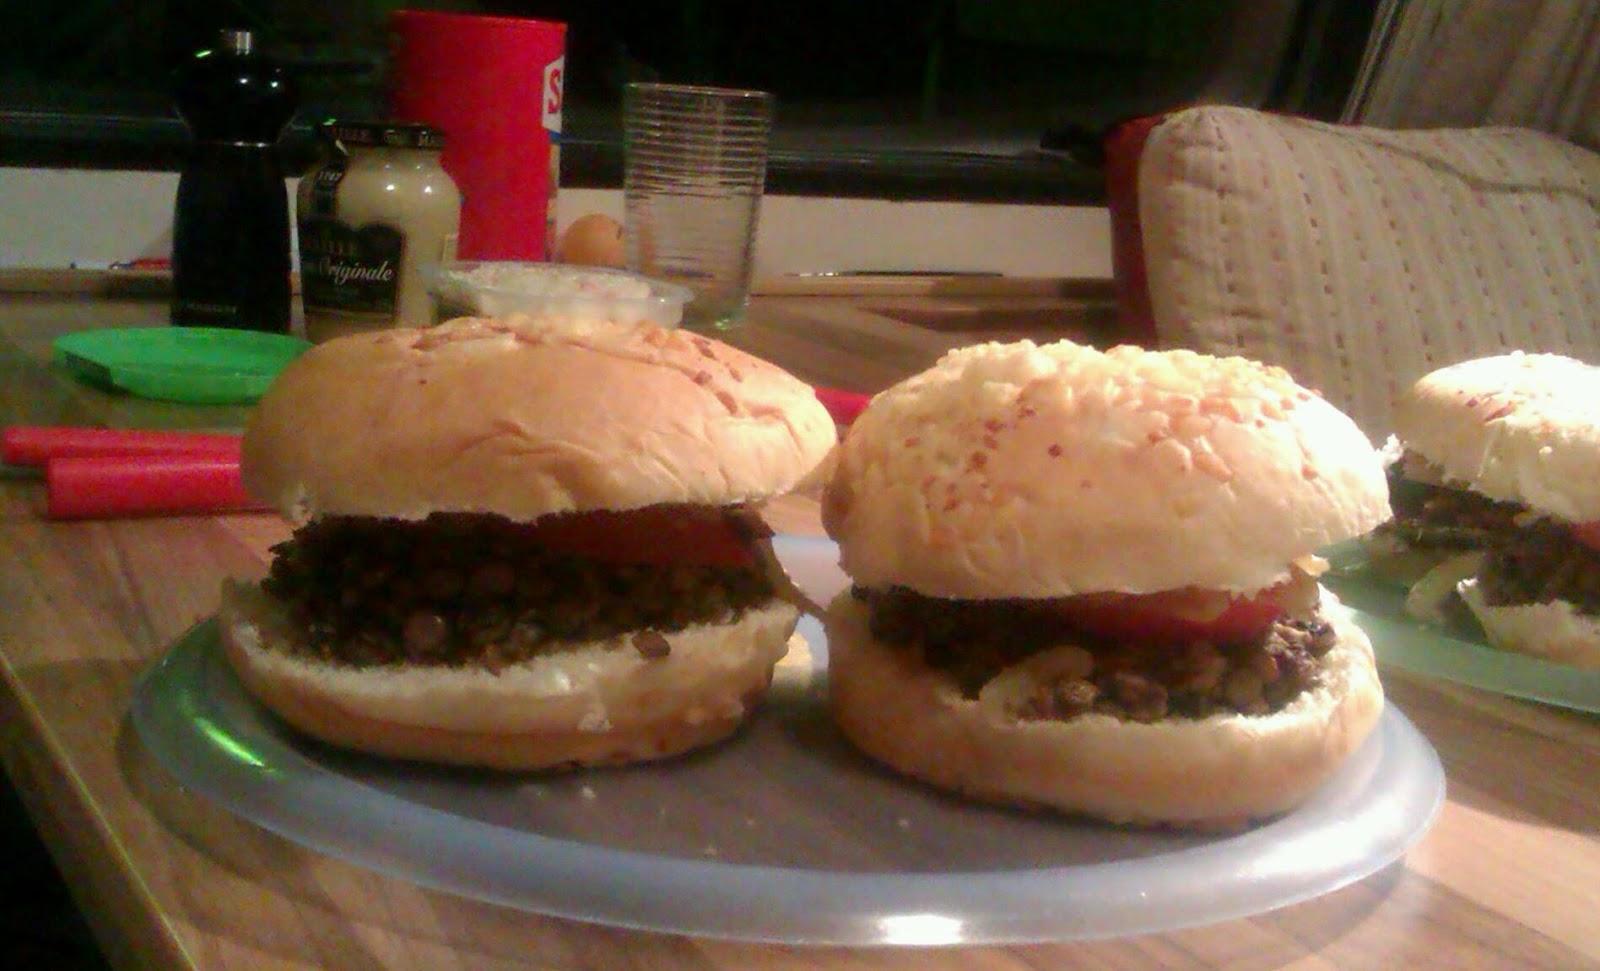 http://ohmyveggies.com/recipe-lentil-mushroom-burgers/